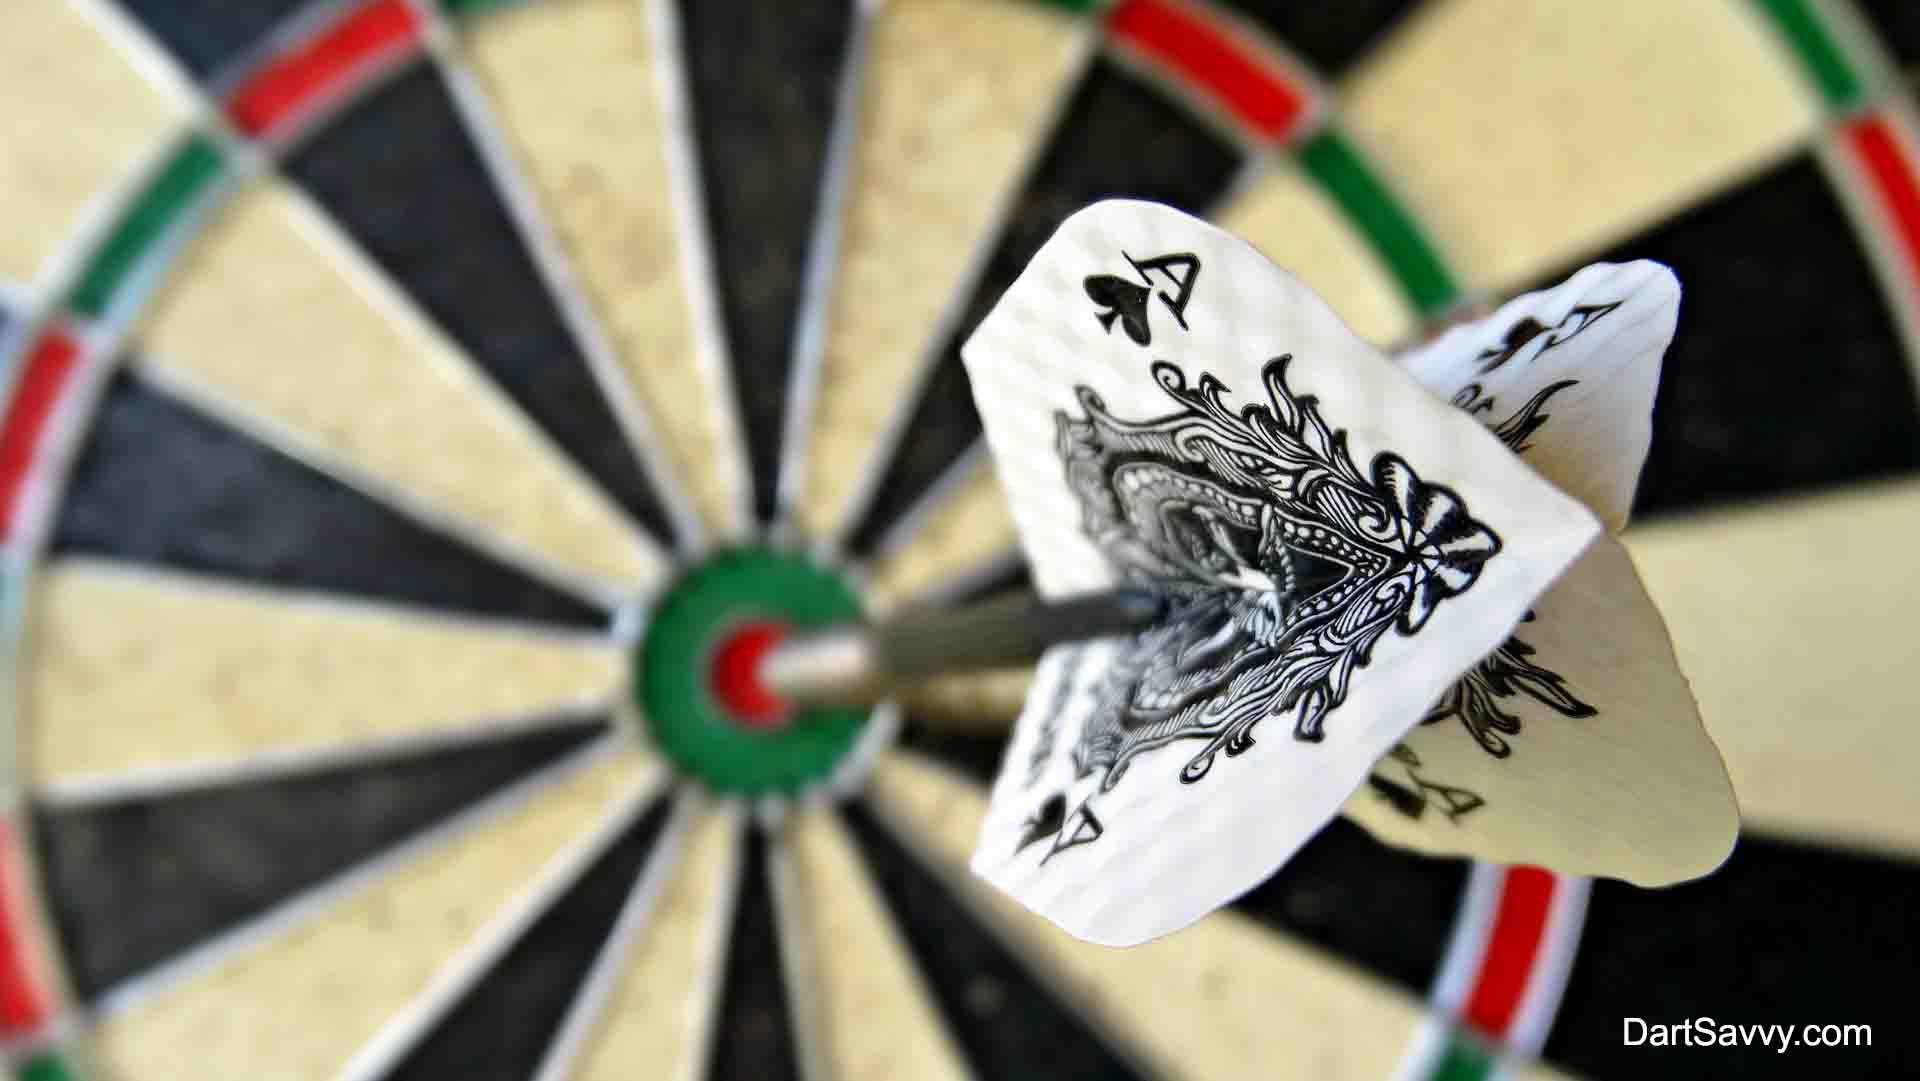 Best Soft tip darts to buy in 2018